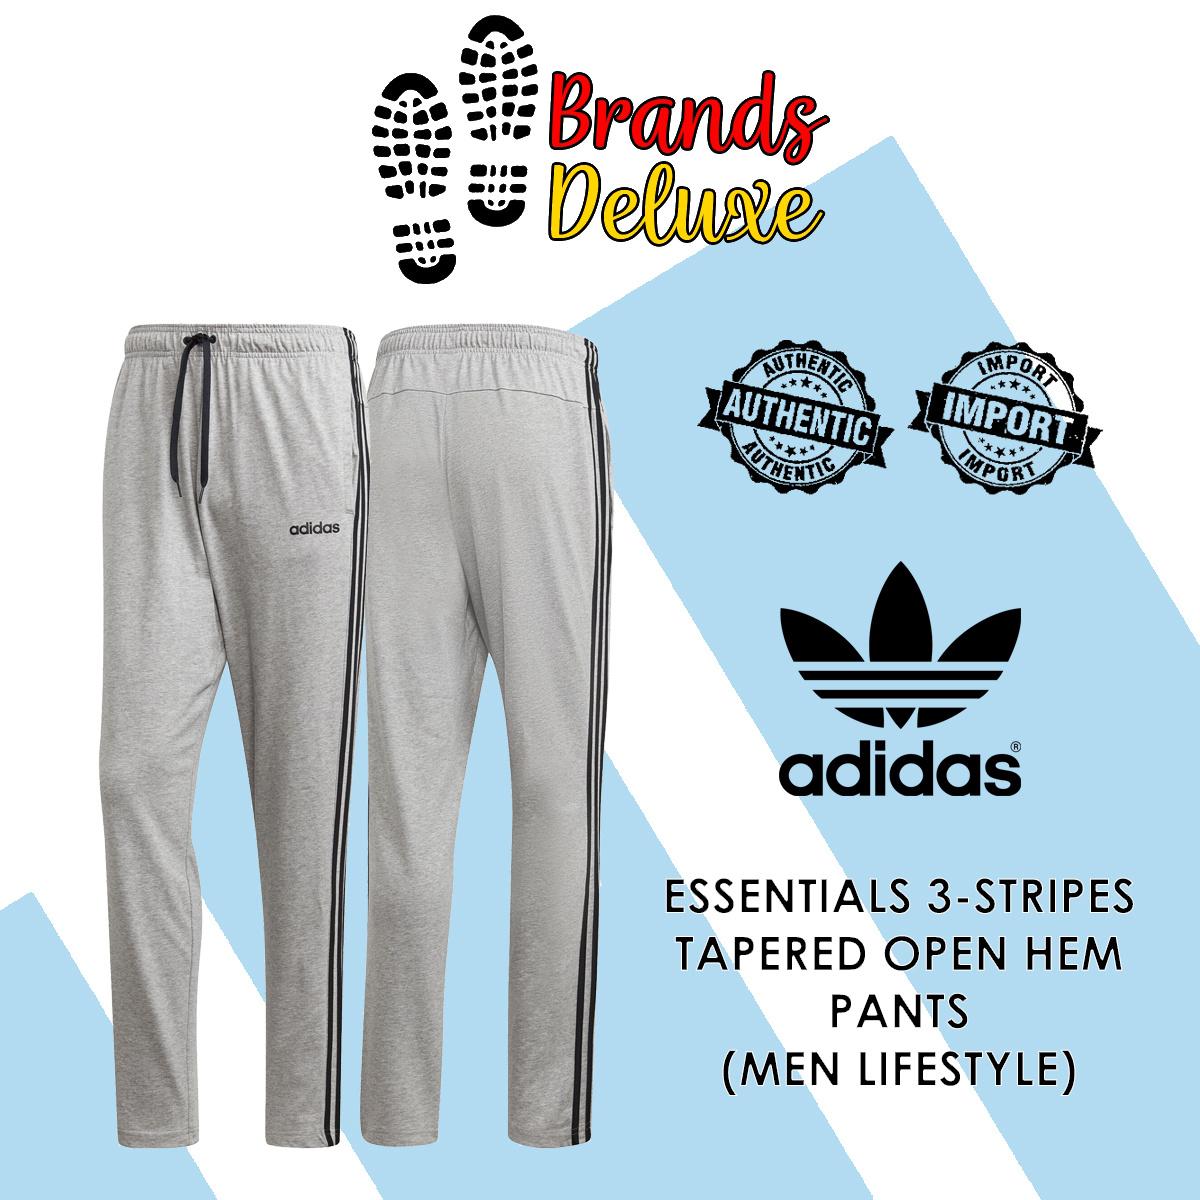 adidas Essentials 3 Stripes Tapered Open Hem Pants Black | adidas Singapore